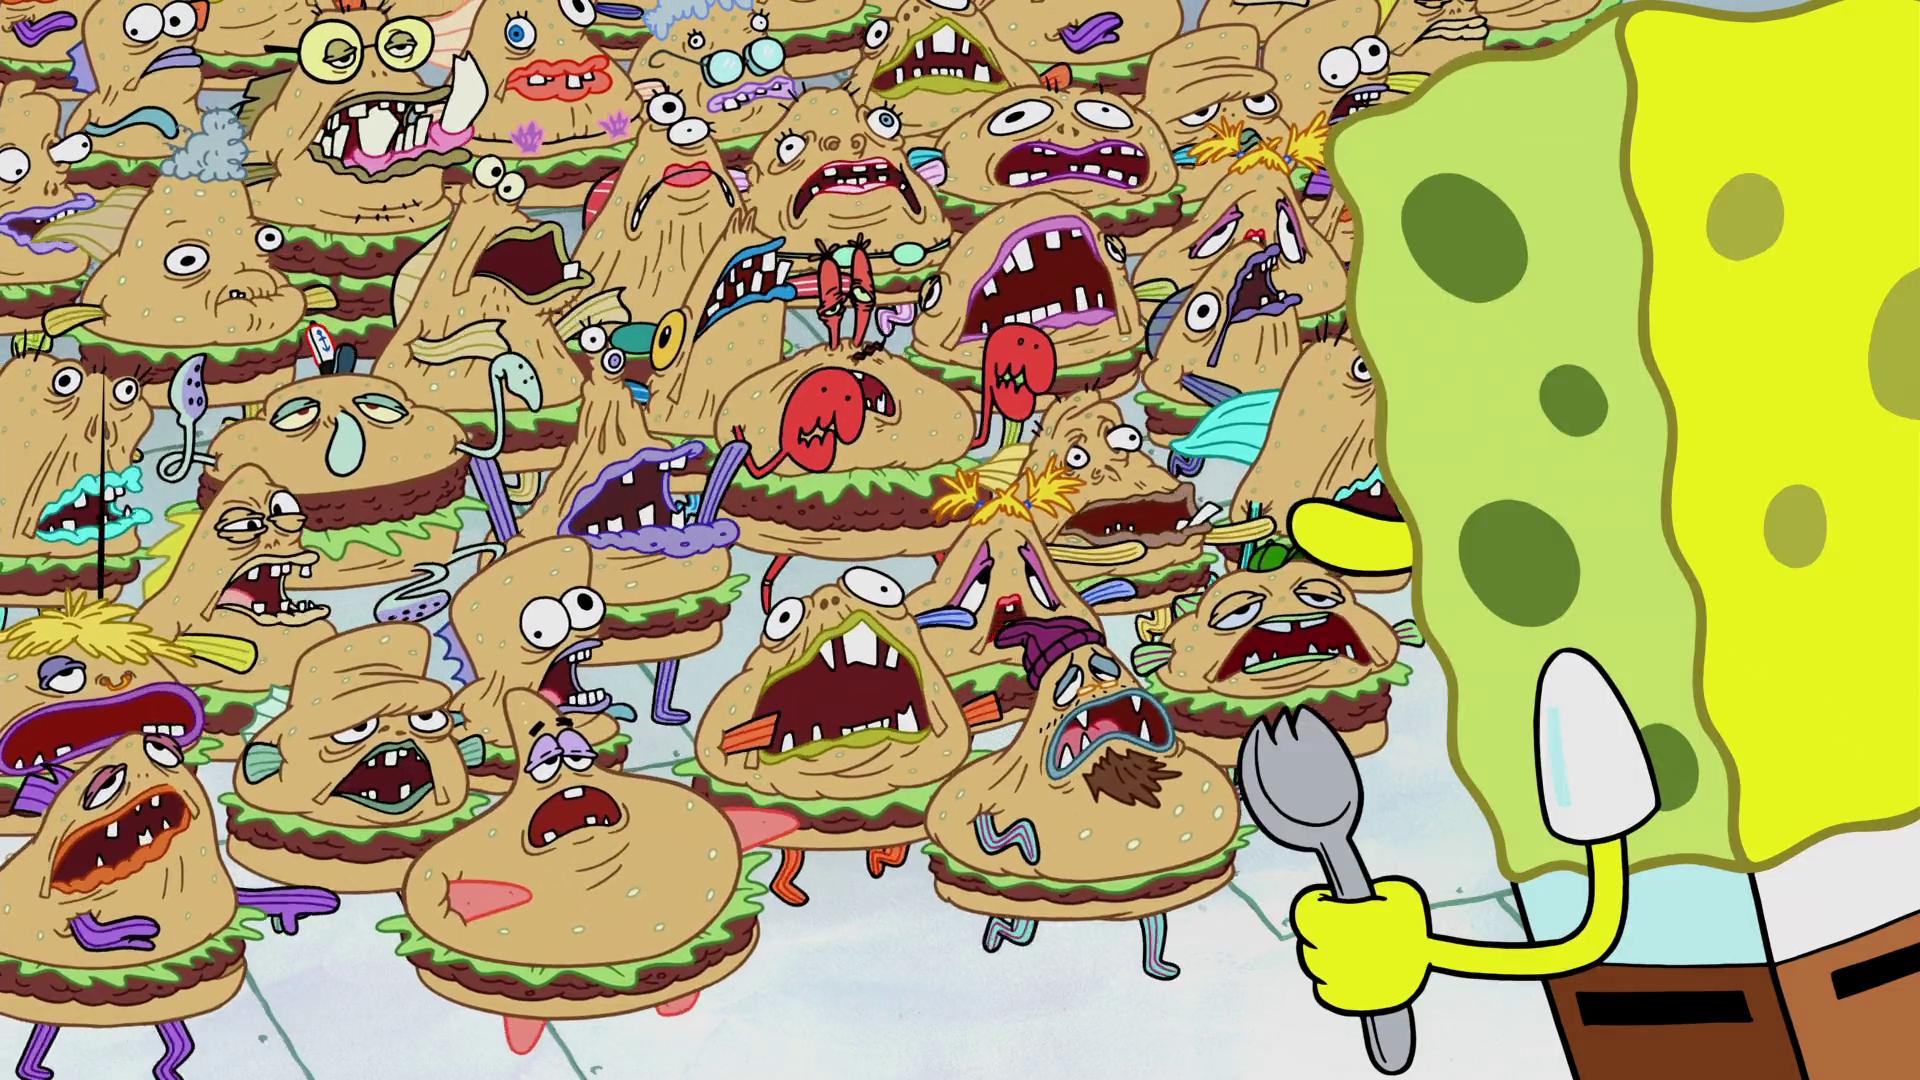 Krabby Patty creatures